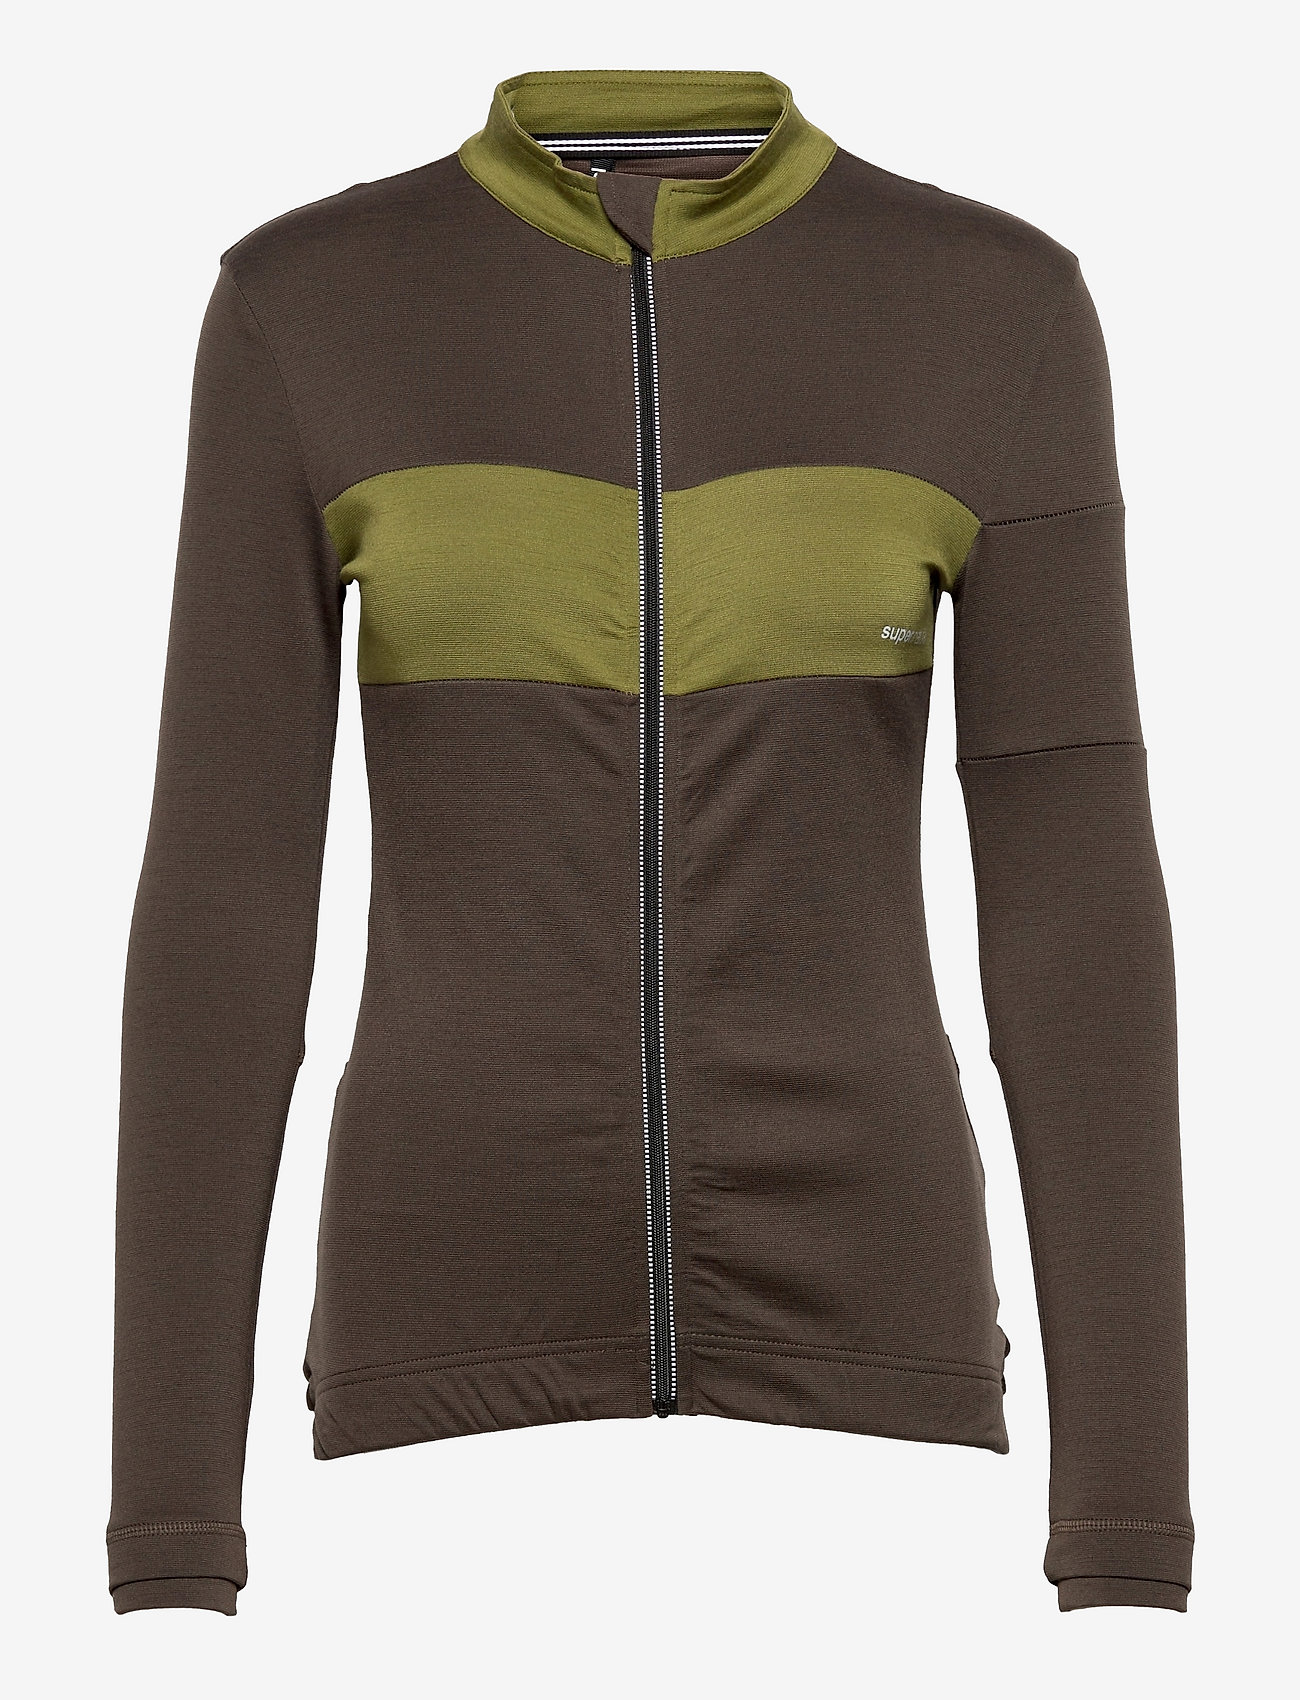 super.natural - W GRAVA LS JERSEY - sweatshirts - wren/avocado - 0